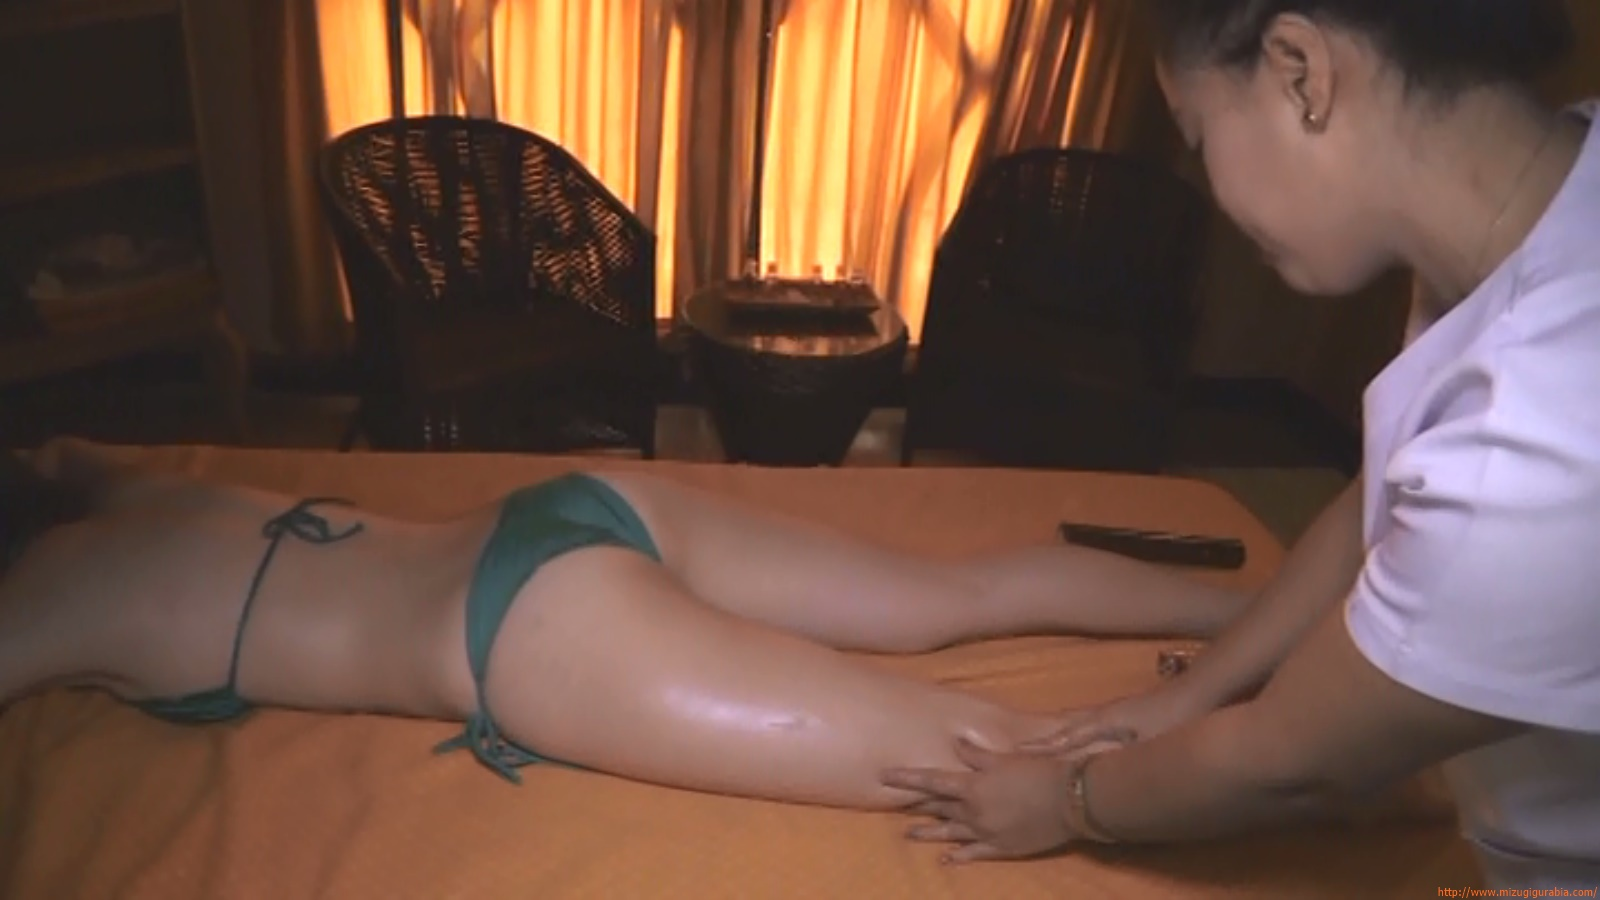 Healing massage146